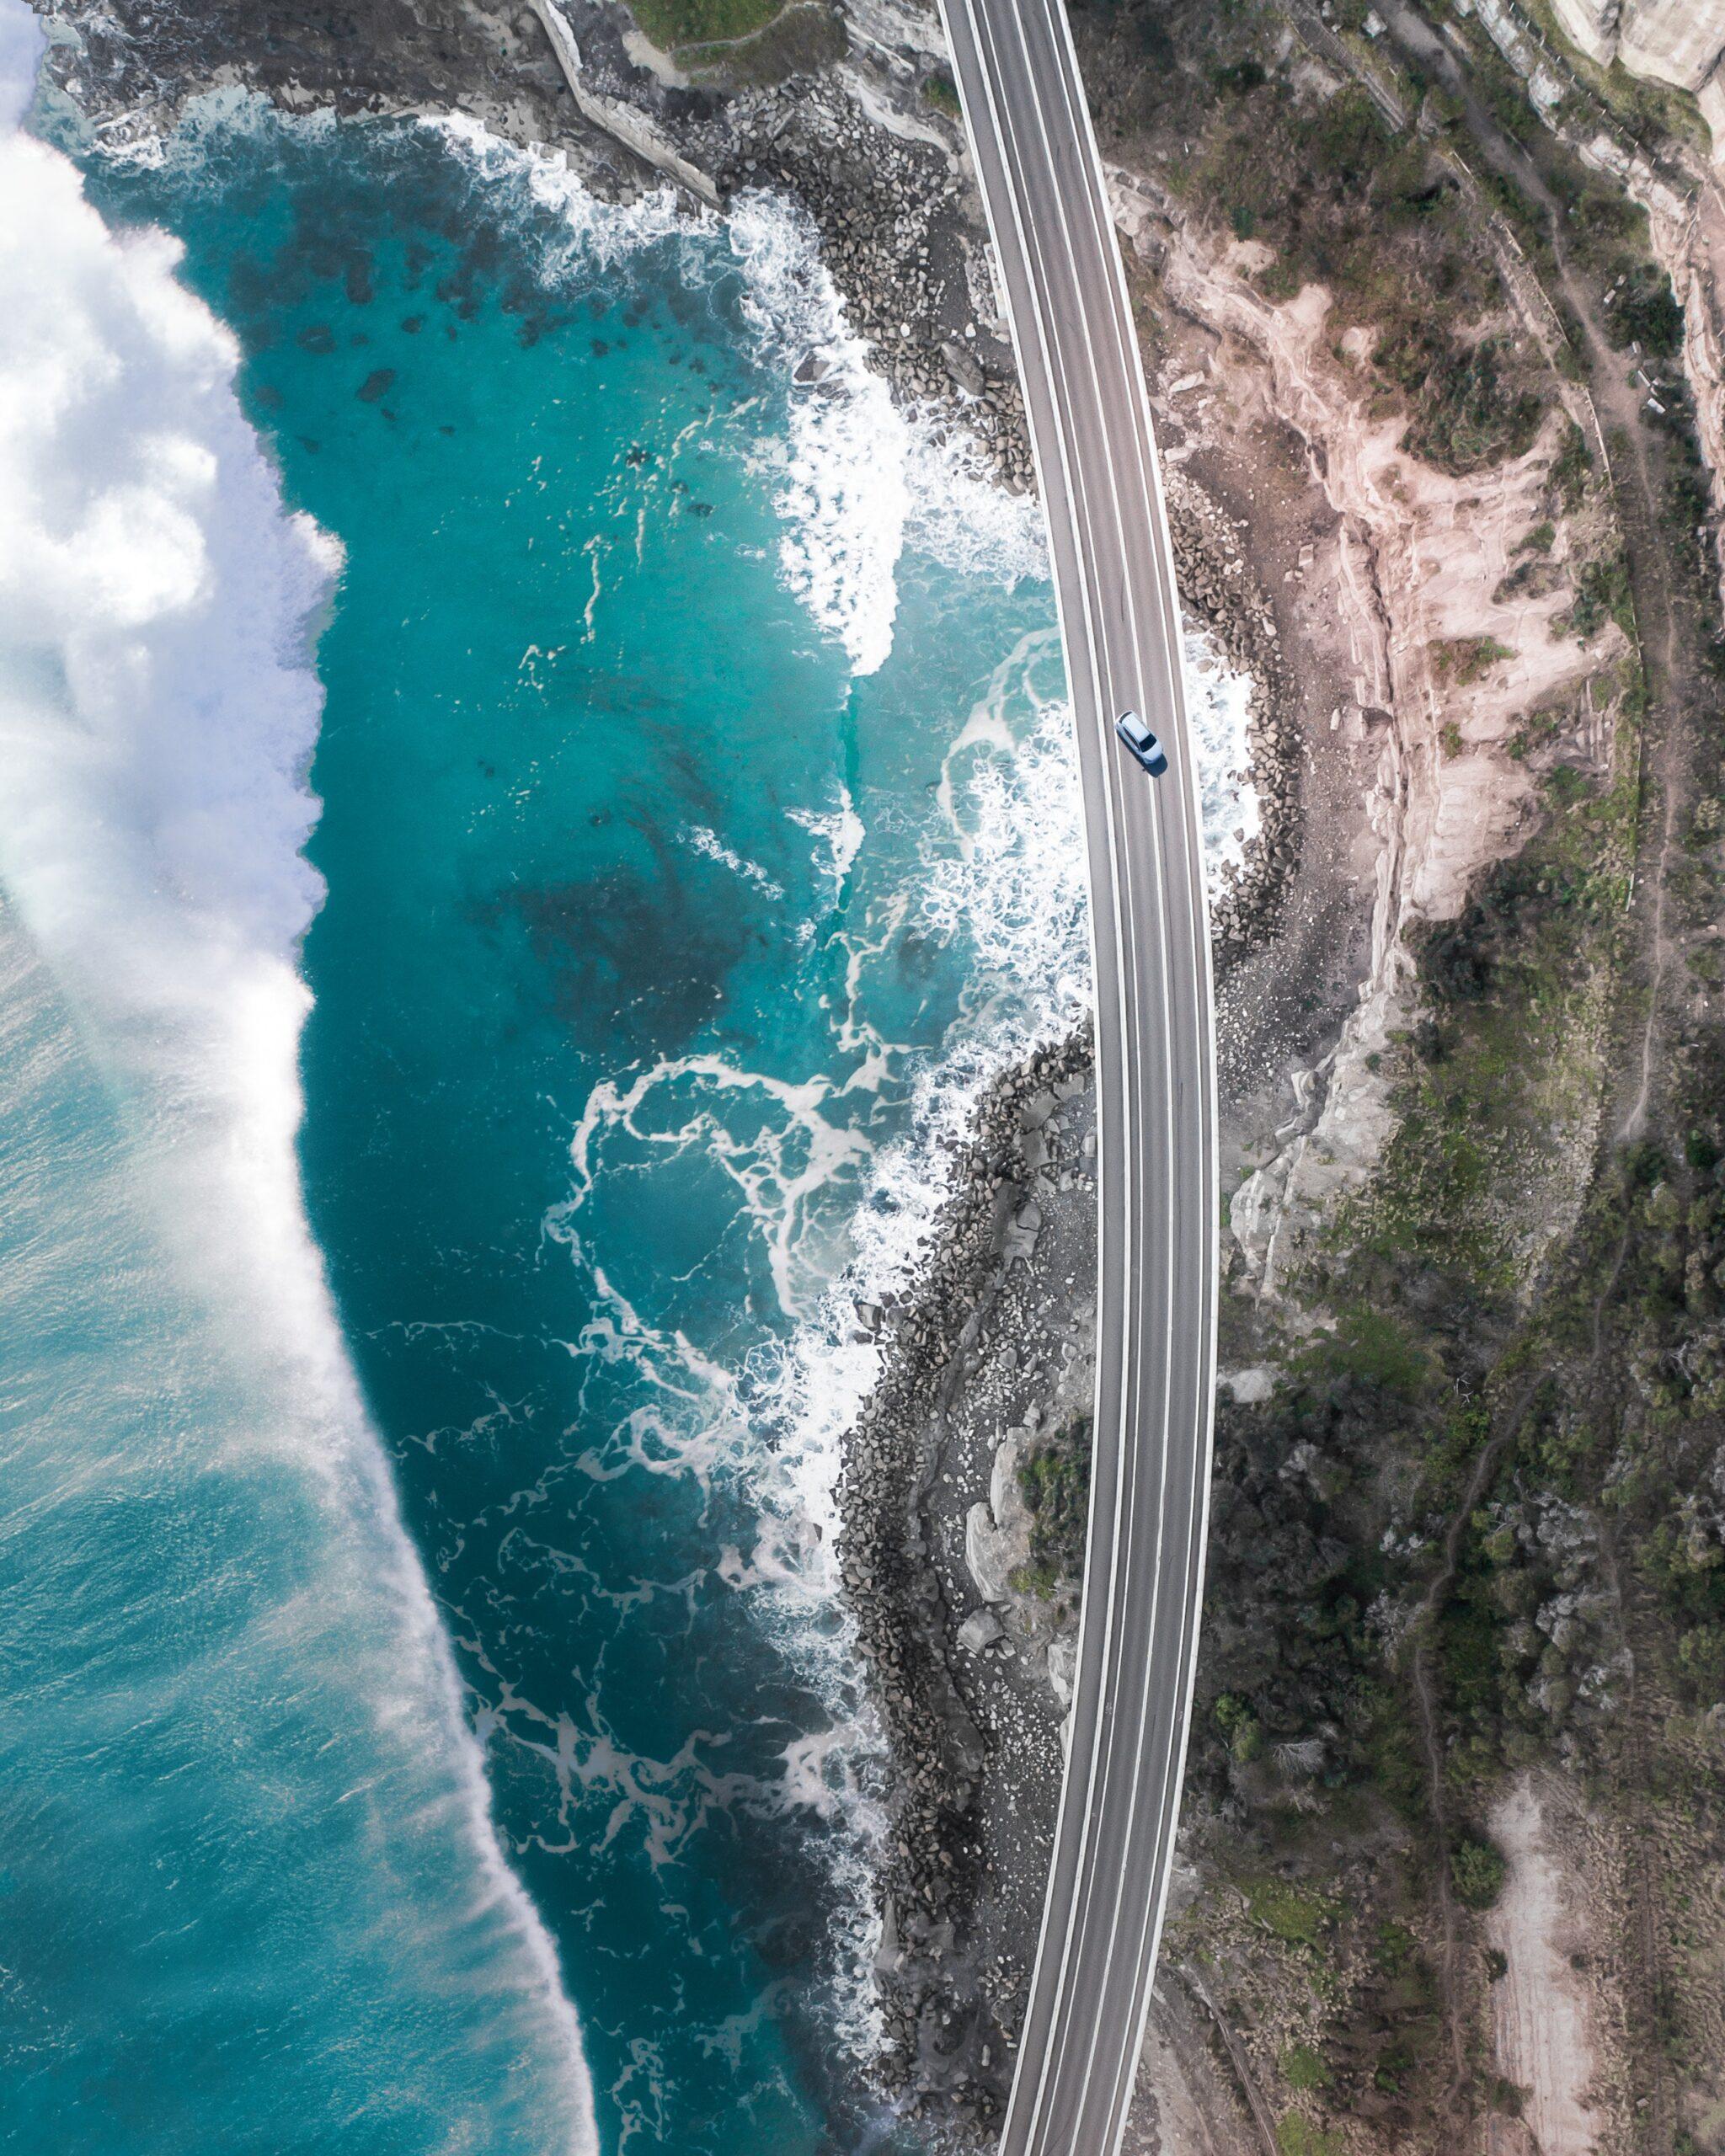 Austalia Lord How Luxury Island | Travel Guide | Elle Blonde Luxury Lifestyle Destination Blog